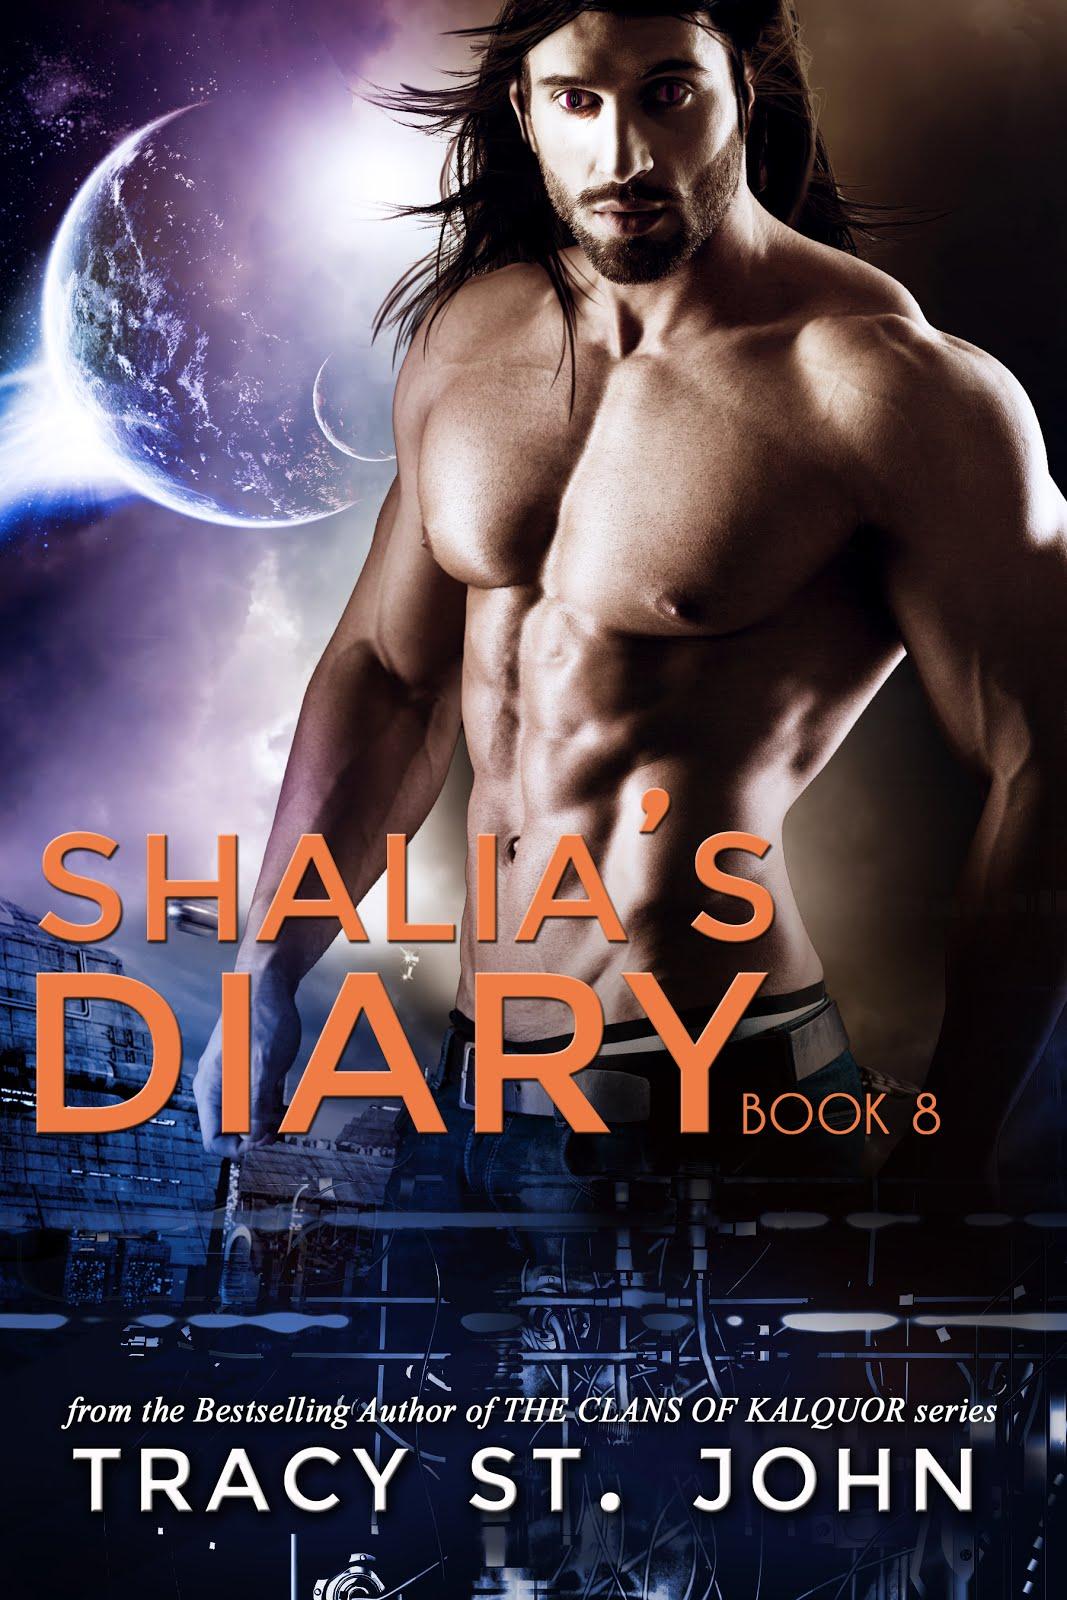 Shalia's Diary Book 8